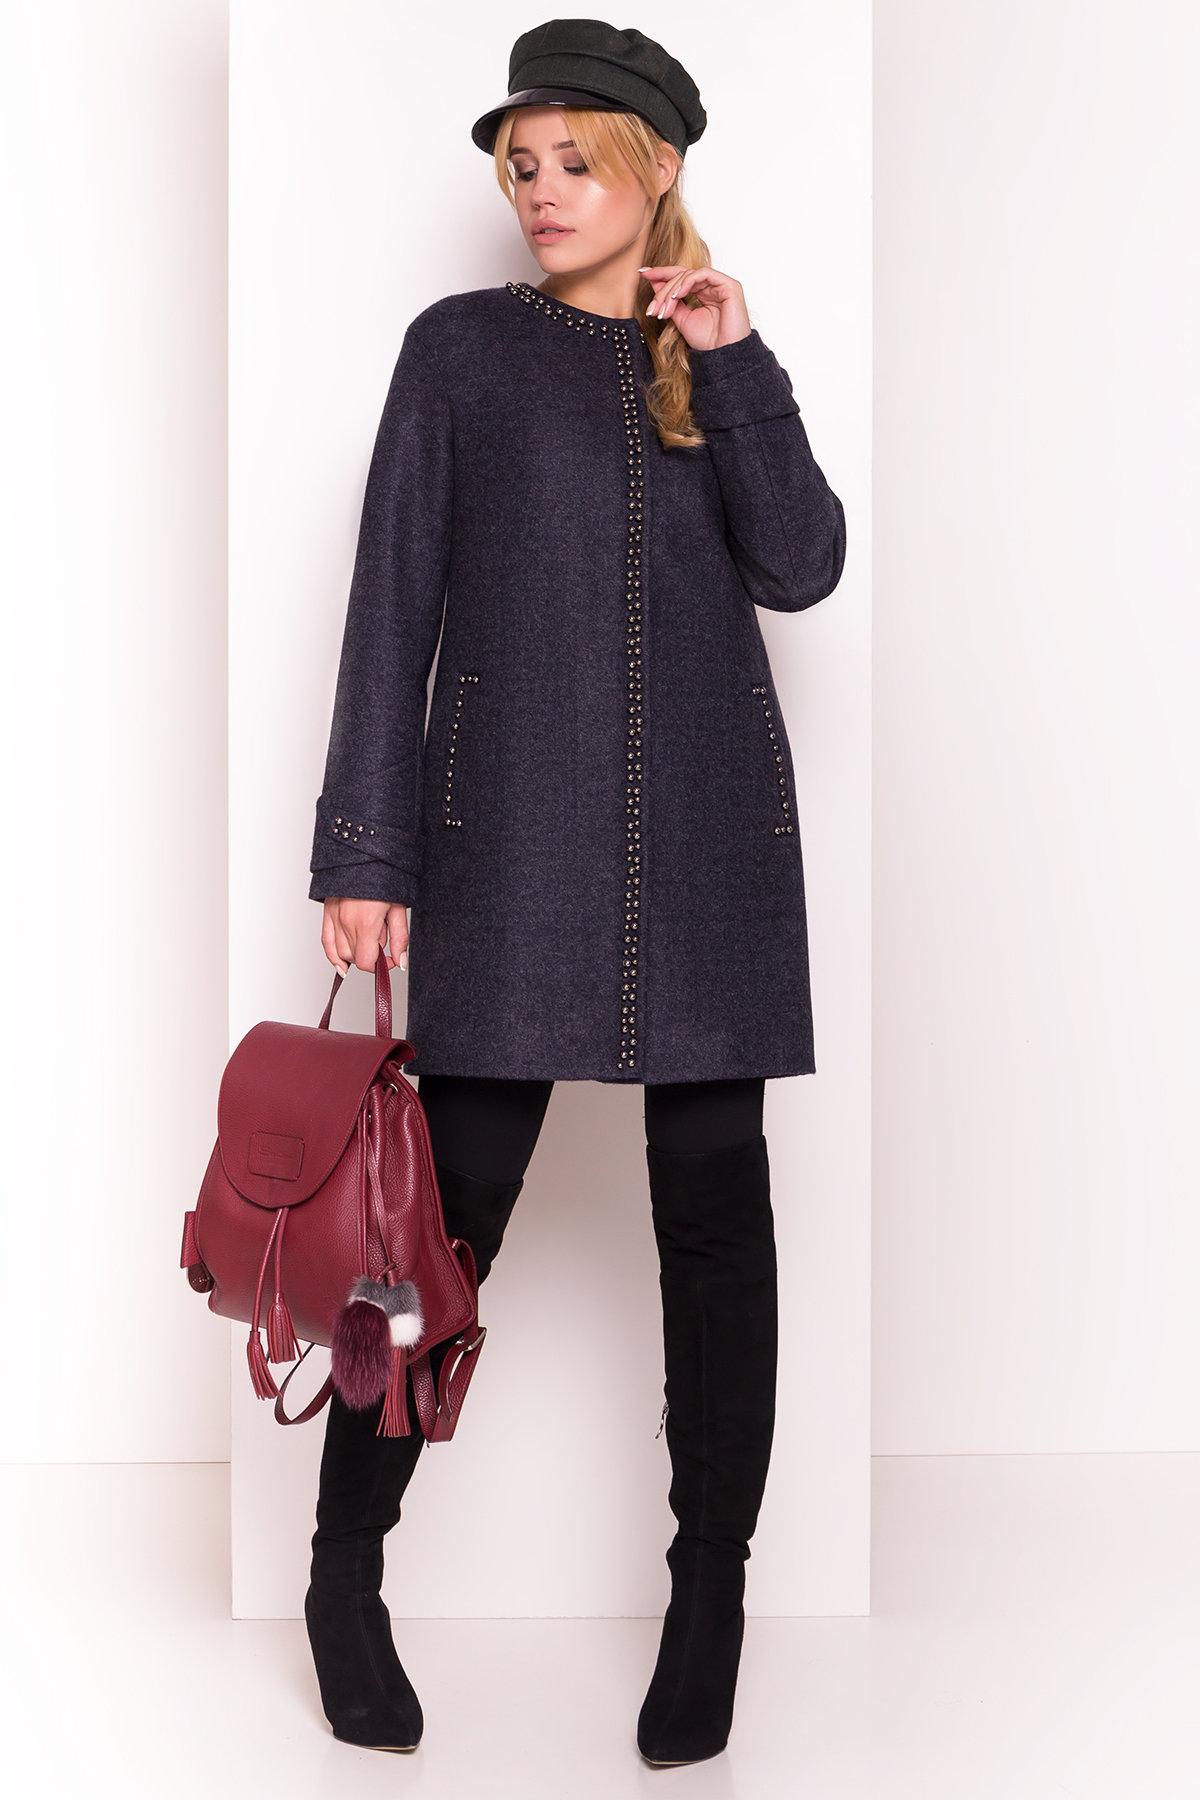 Пальто Анси 4544 Цвет: Темно-синий